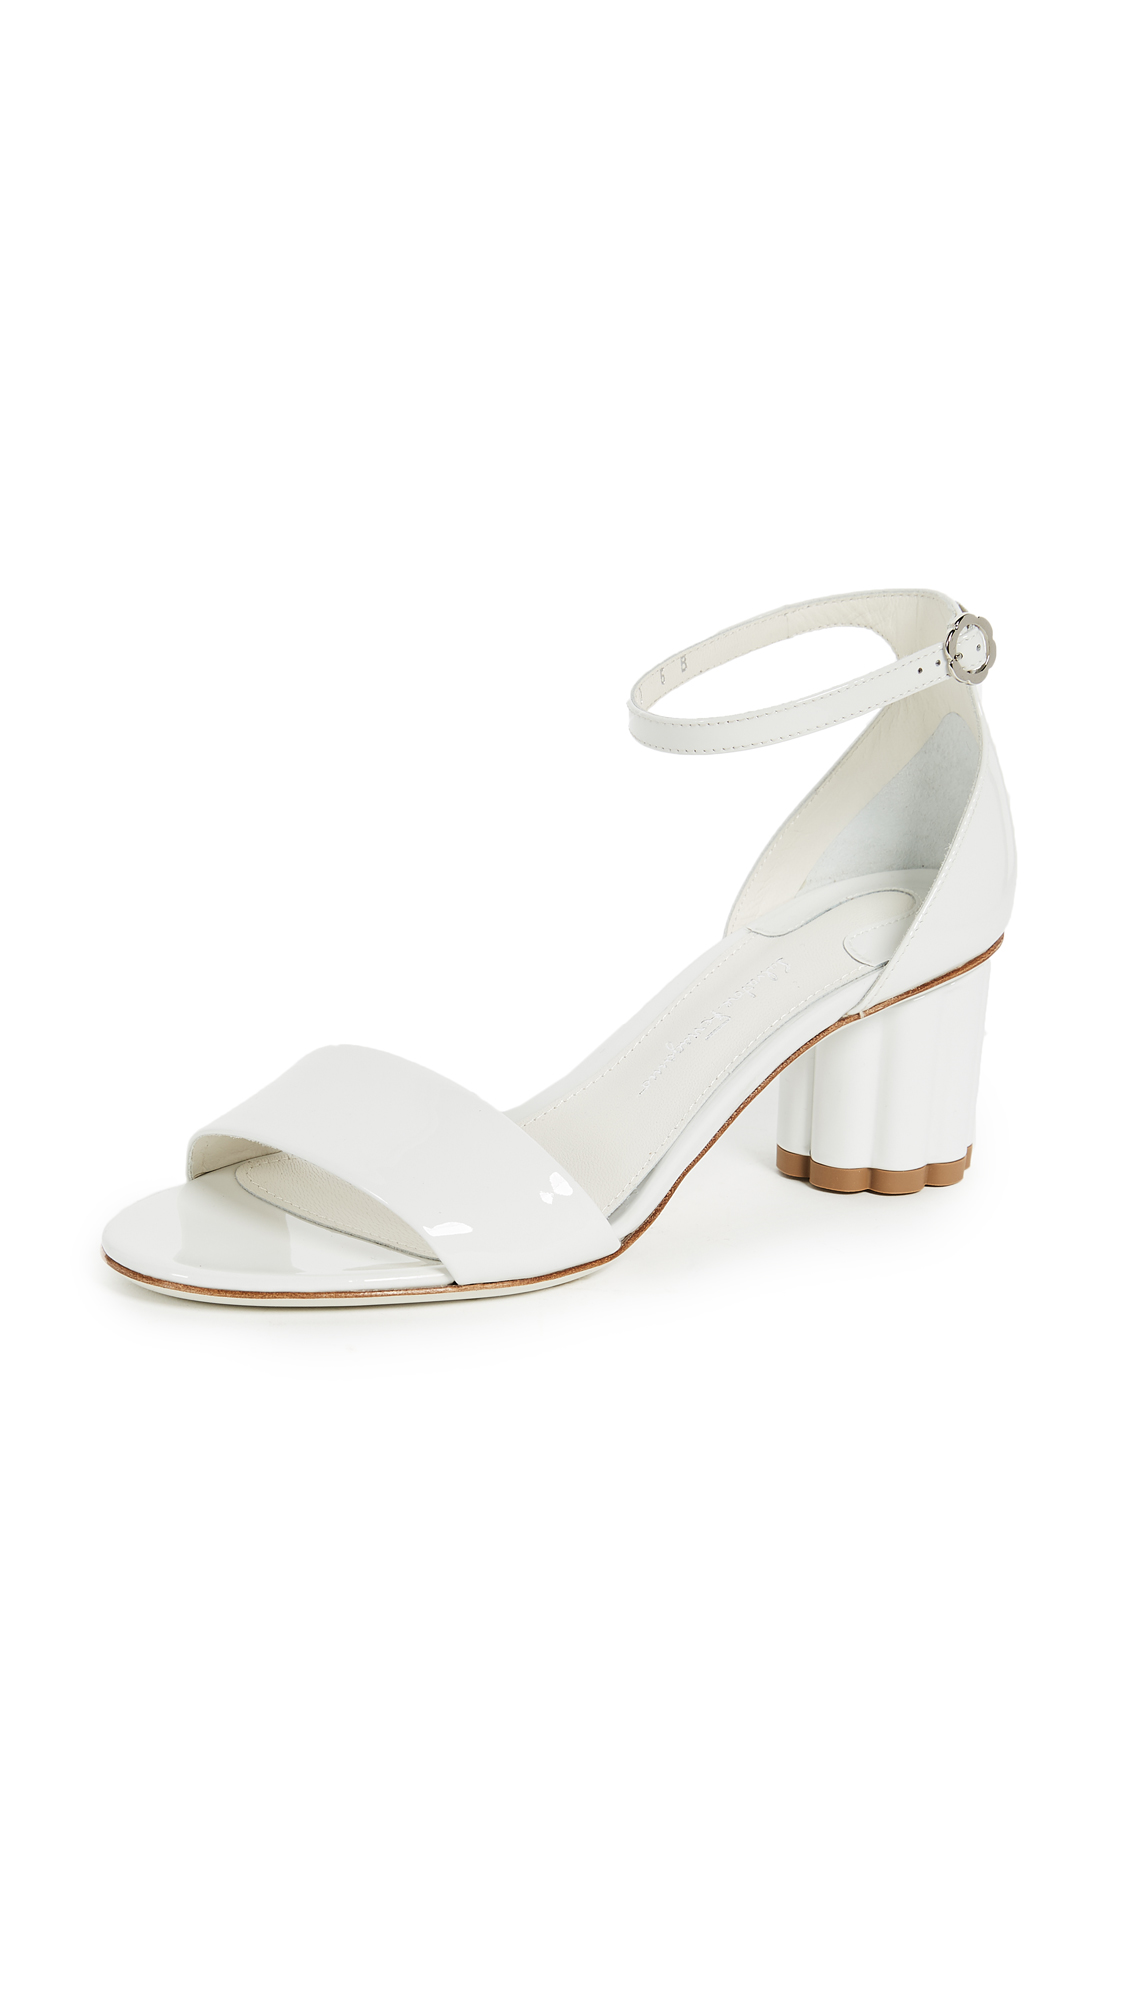 Salvatore Ferragamo Erclea Sandals - New Bianco